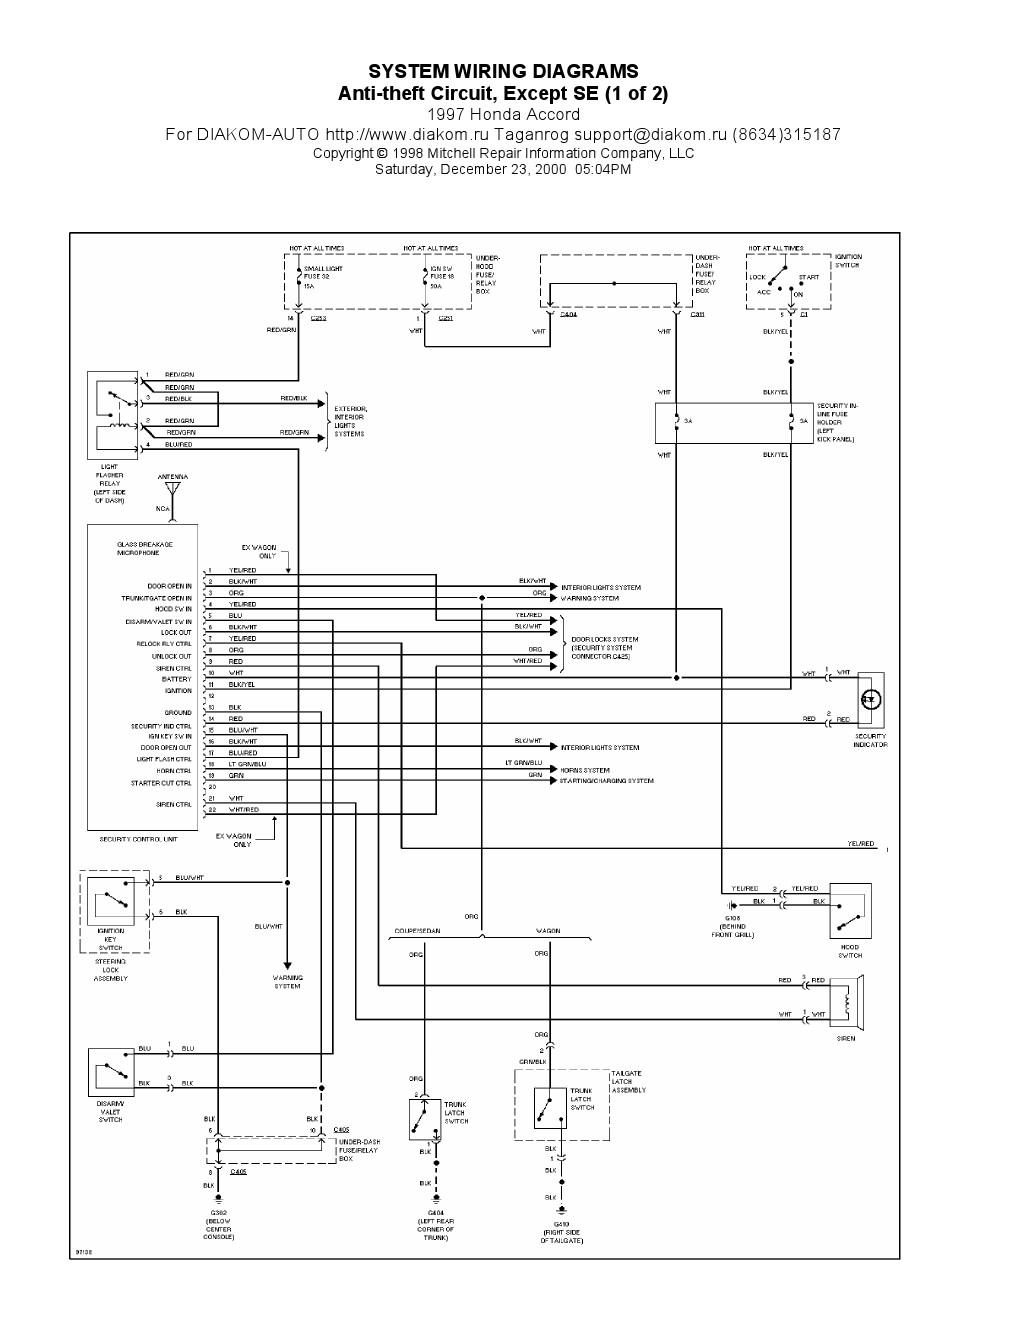 94 Honda Accord Theft Wiring Diagram - General Wiring Diagrams recent -  recent.leinivbc.it